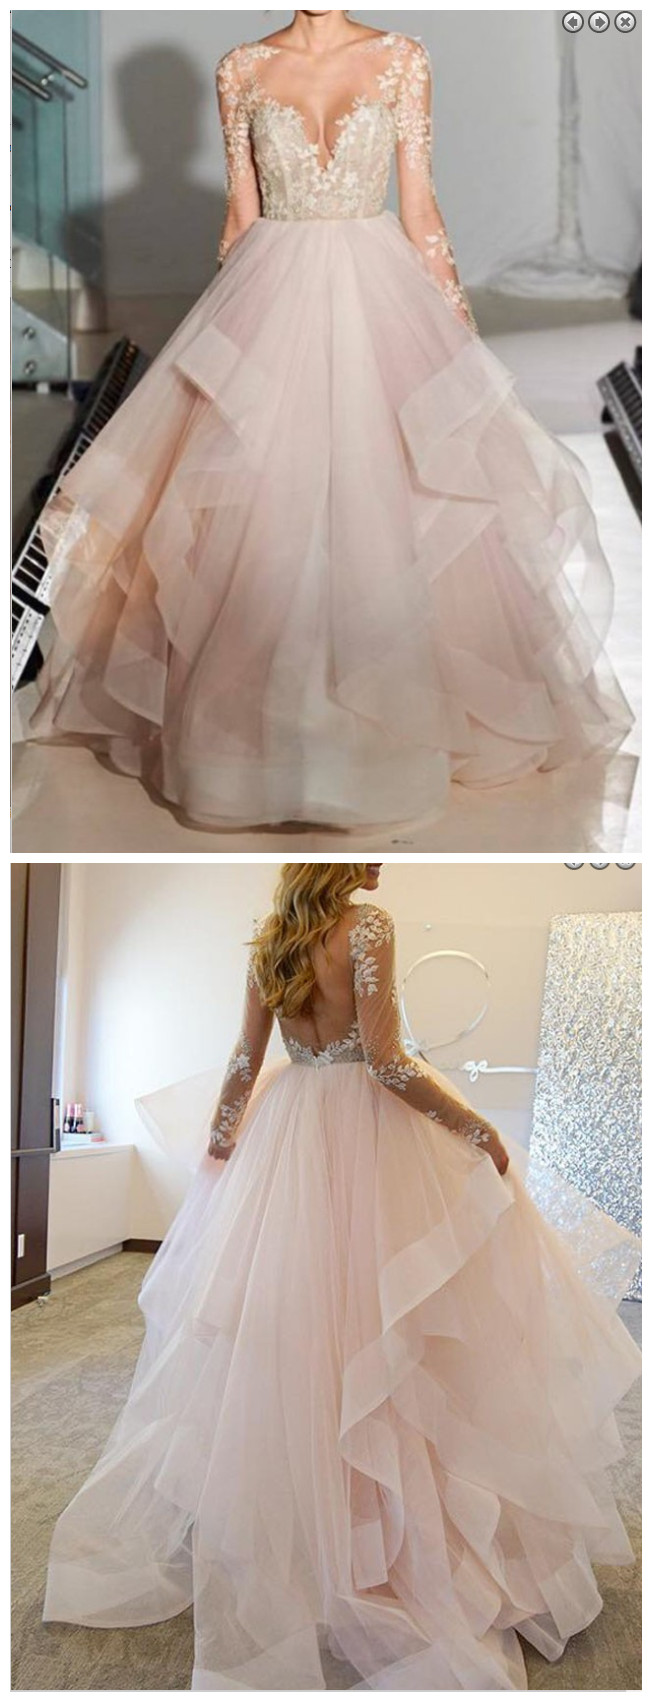 Elegant_A-Line_Bateau_Long_Sleeves_Illusion_Back_Appliques_Beading_Tulle_Wedding_Dress